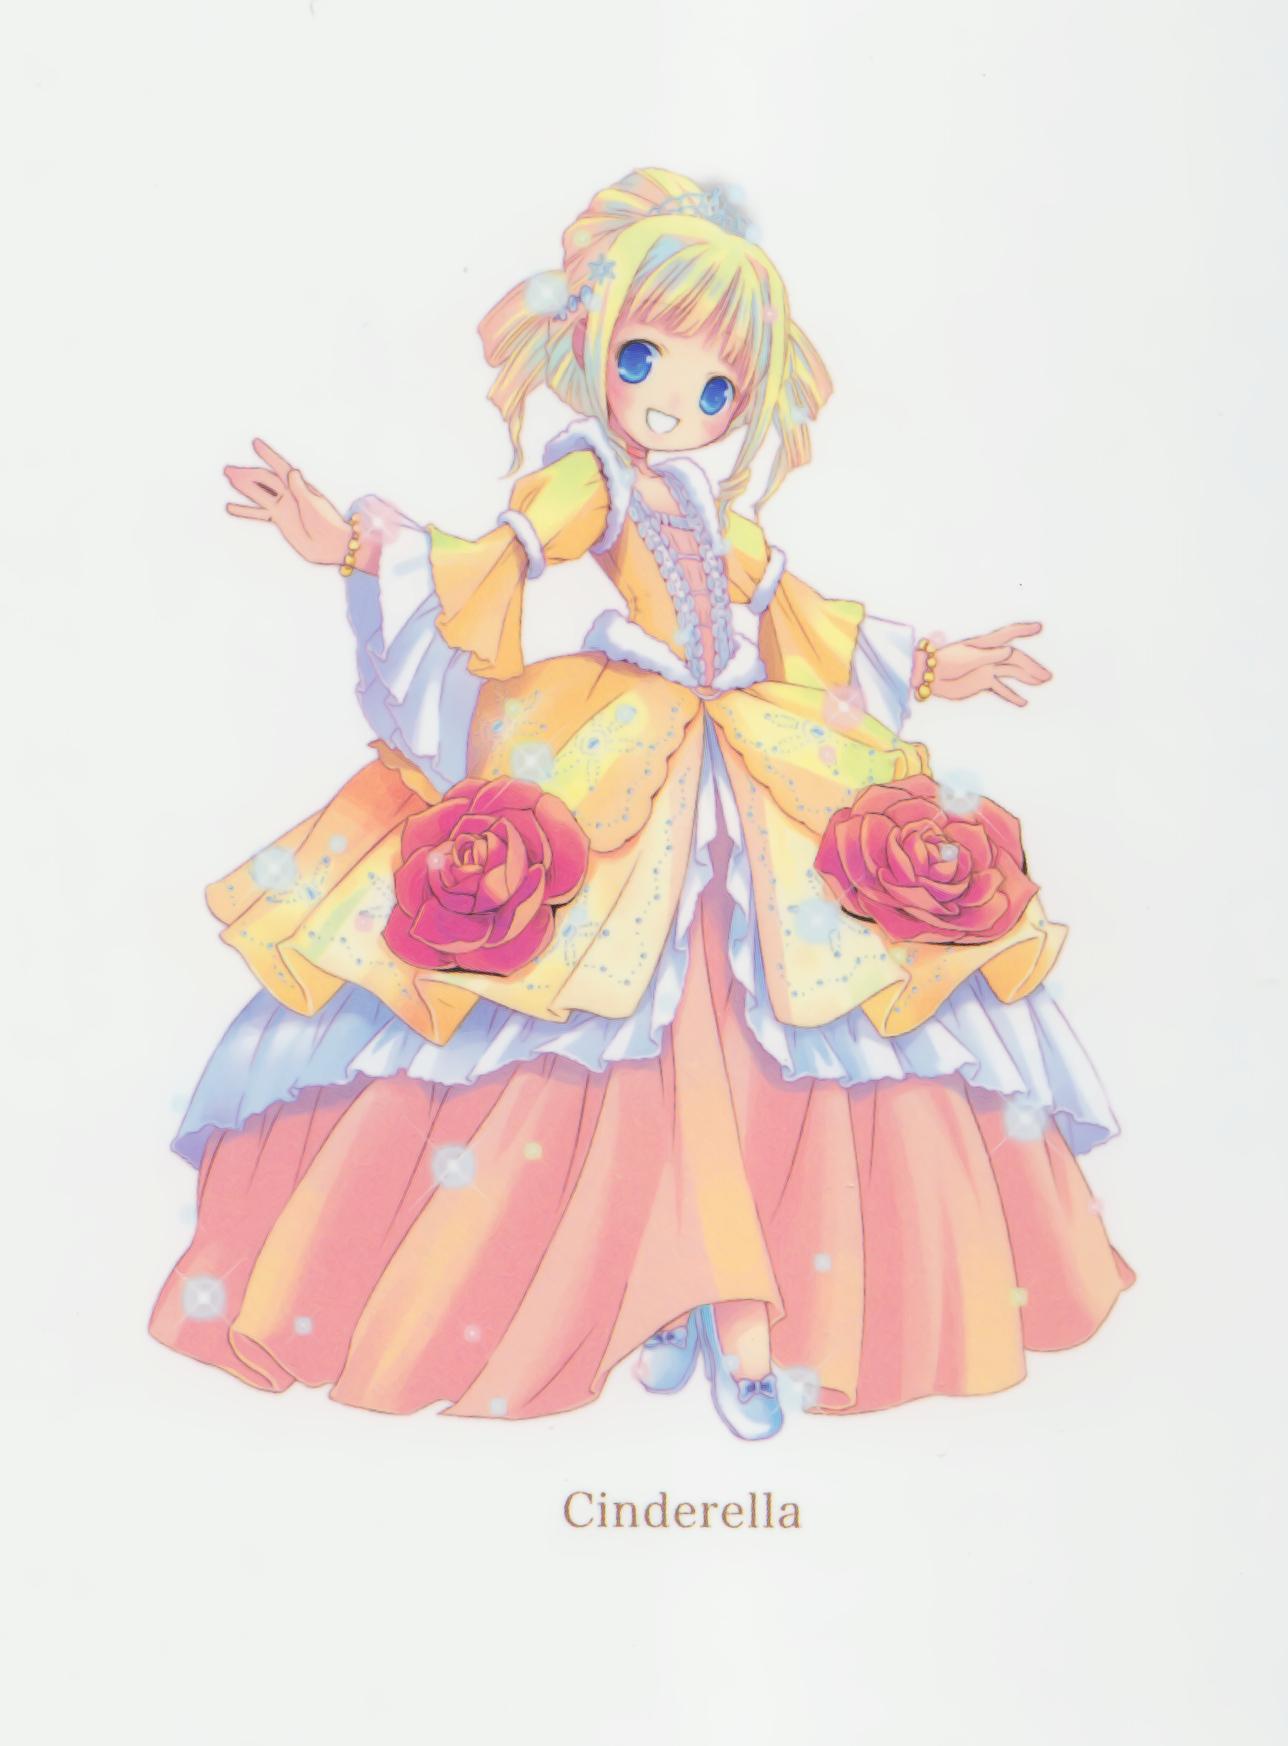 Pop Wonderland Cinderella Zerochan Anime Image Board